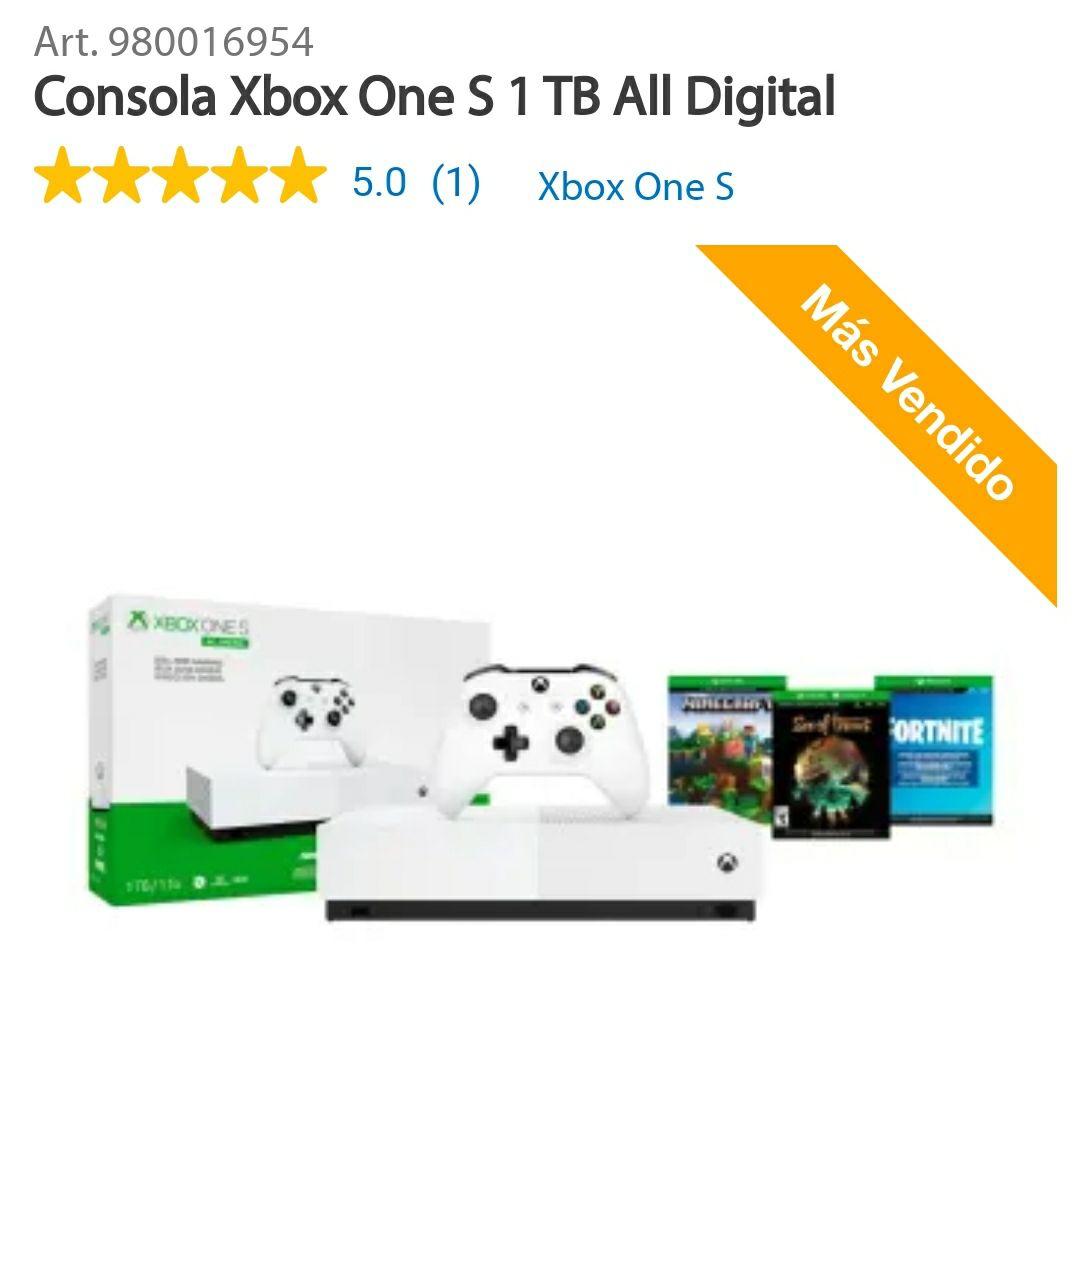 Sam's Club en linea: Xbox One Digital. 19% de descuento pagando con Inbursa o 16% de descuento pagando con Bancomer + 9 meses sin intereses.